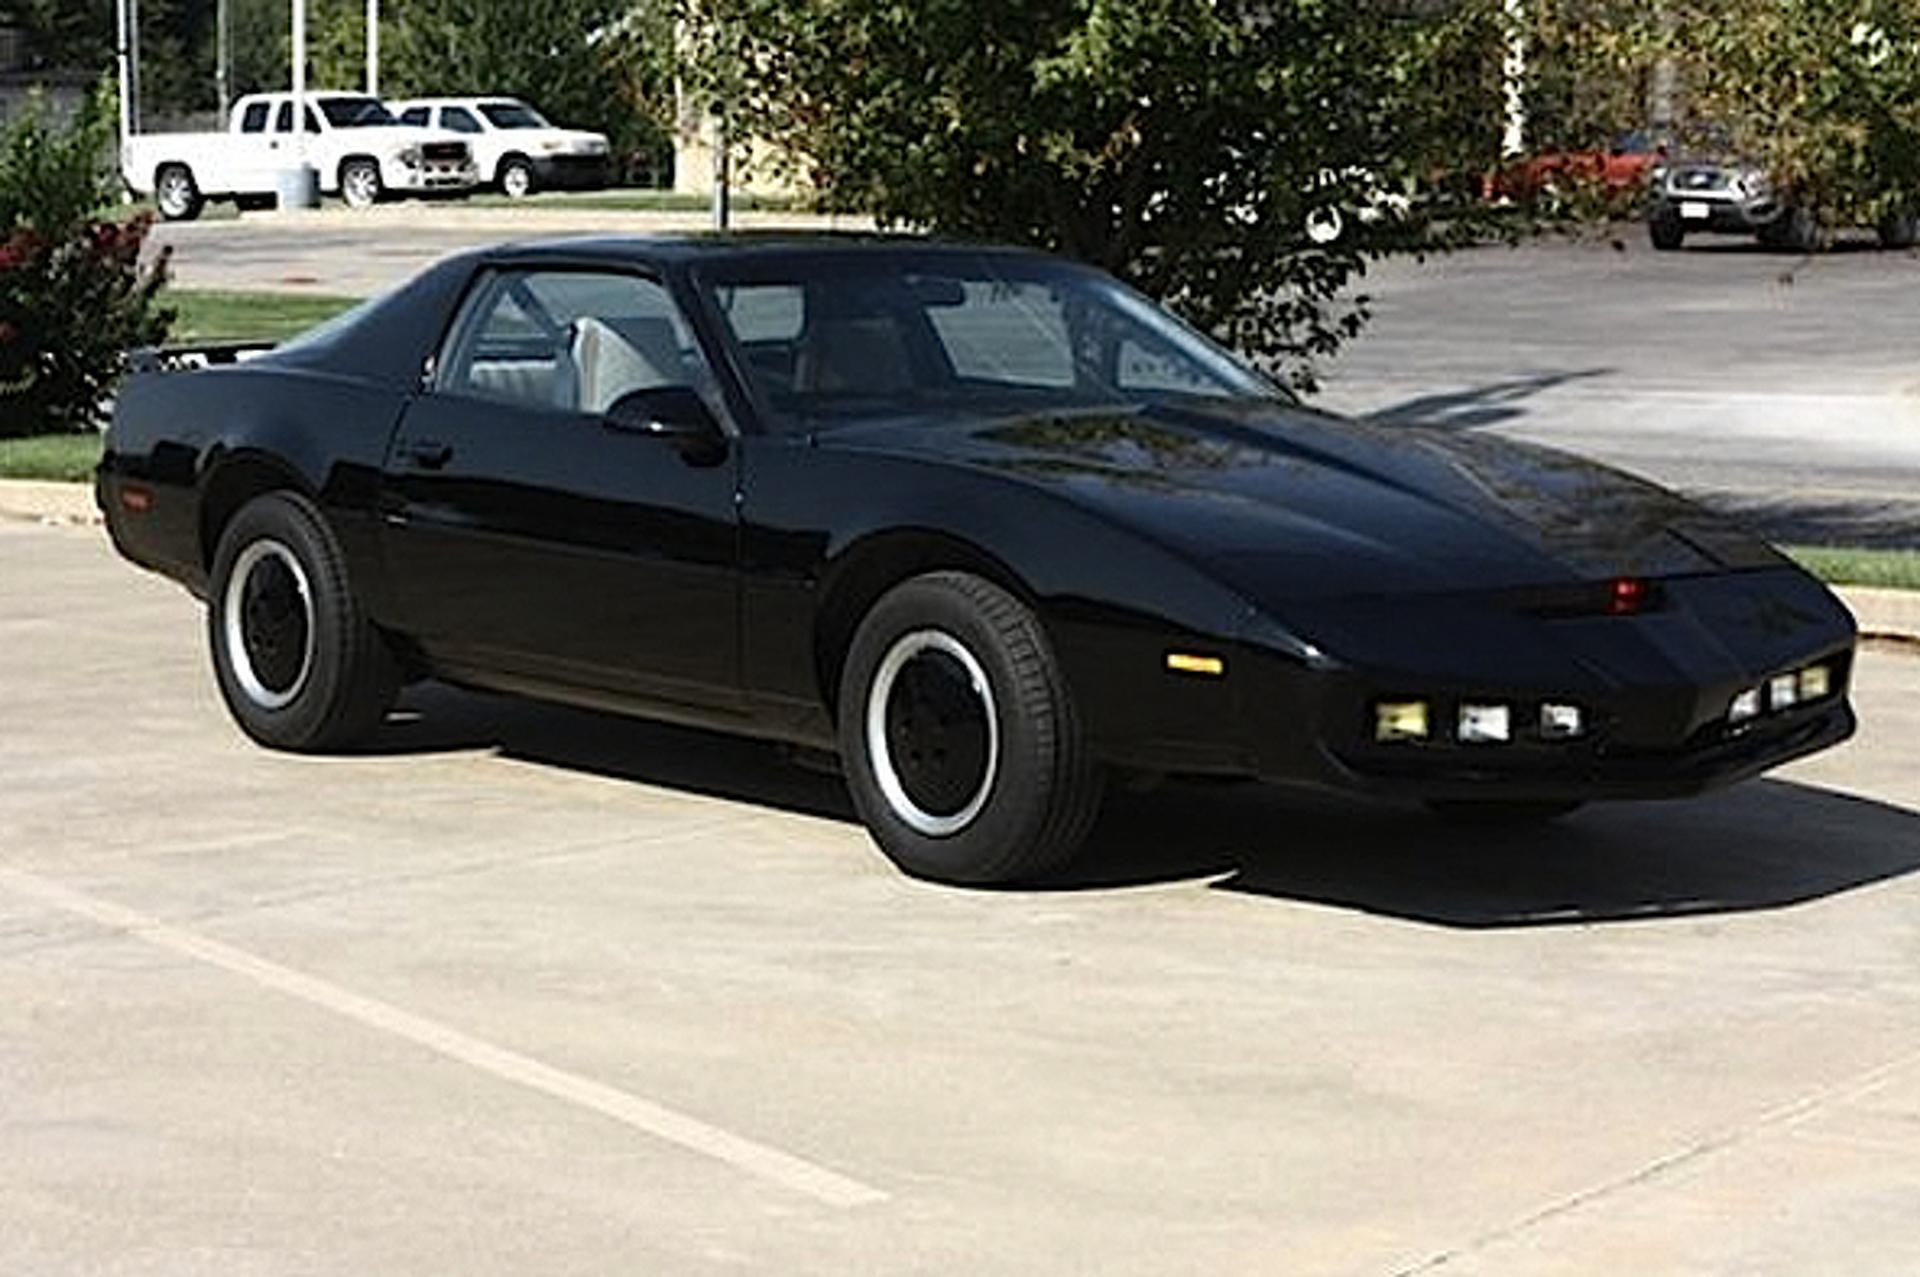 Ebay Car Of The Week 1986 Pontiac Firebird Knight Rider